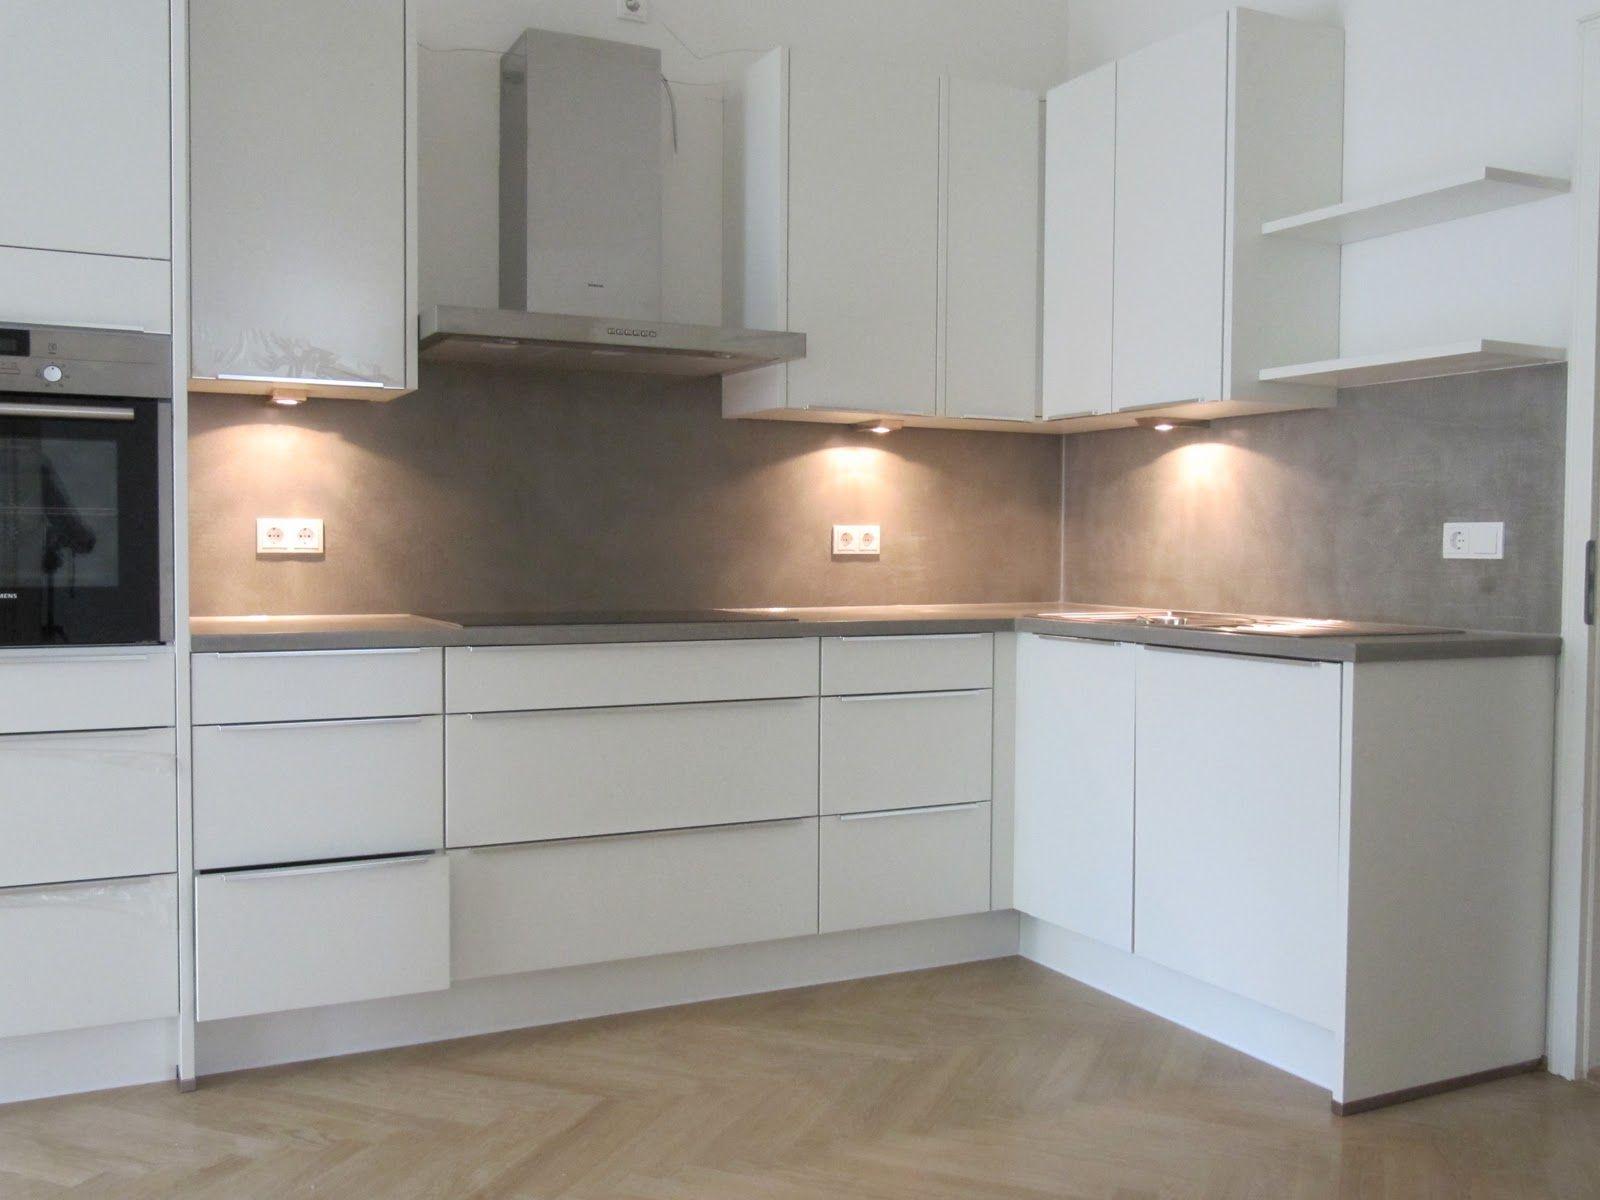 Pin Von Gabrijela Kesten Auf Kitchen Betonkuche Kuche Beton Arbeitsplatte Kuche